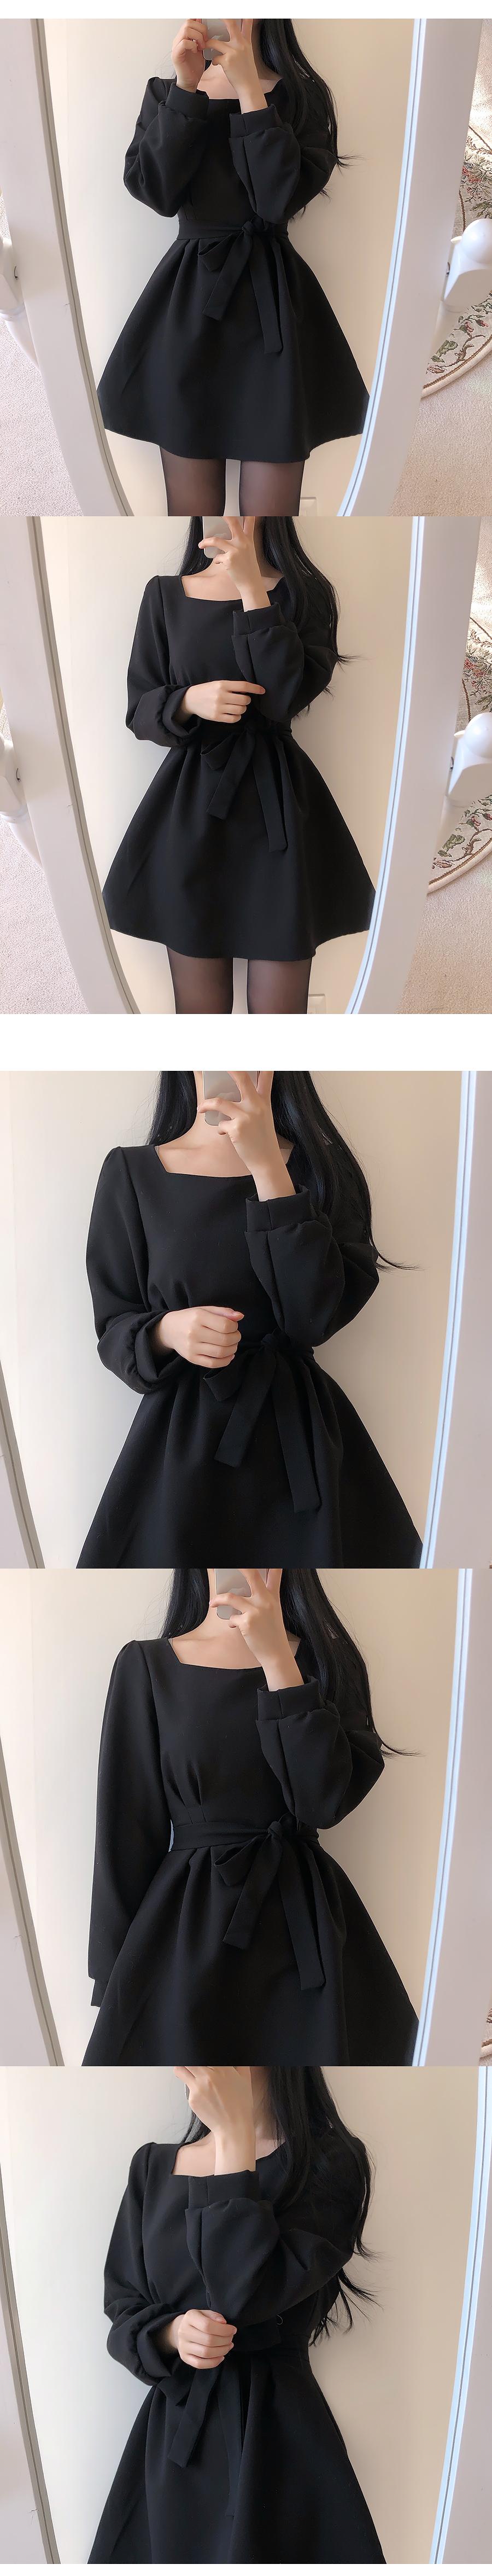 Self-made ♥ Hershey Heartneck Pin Tuck Dress